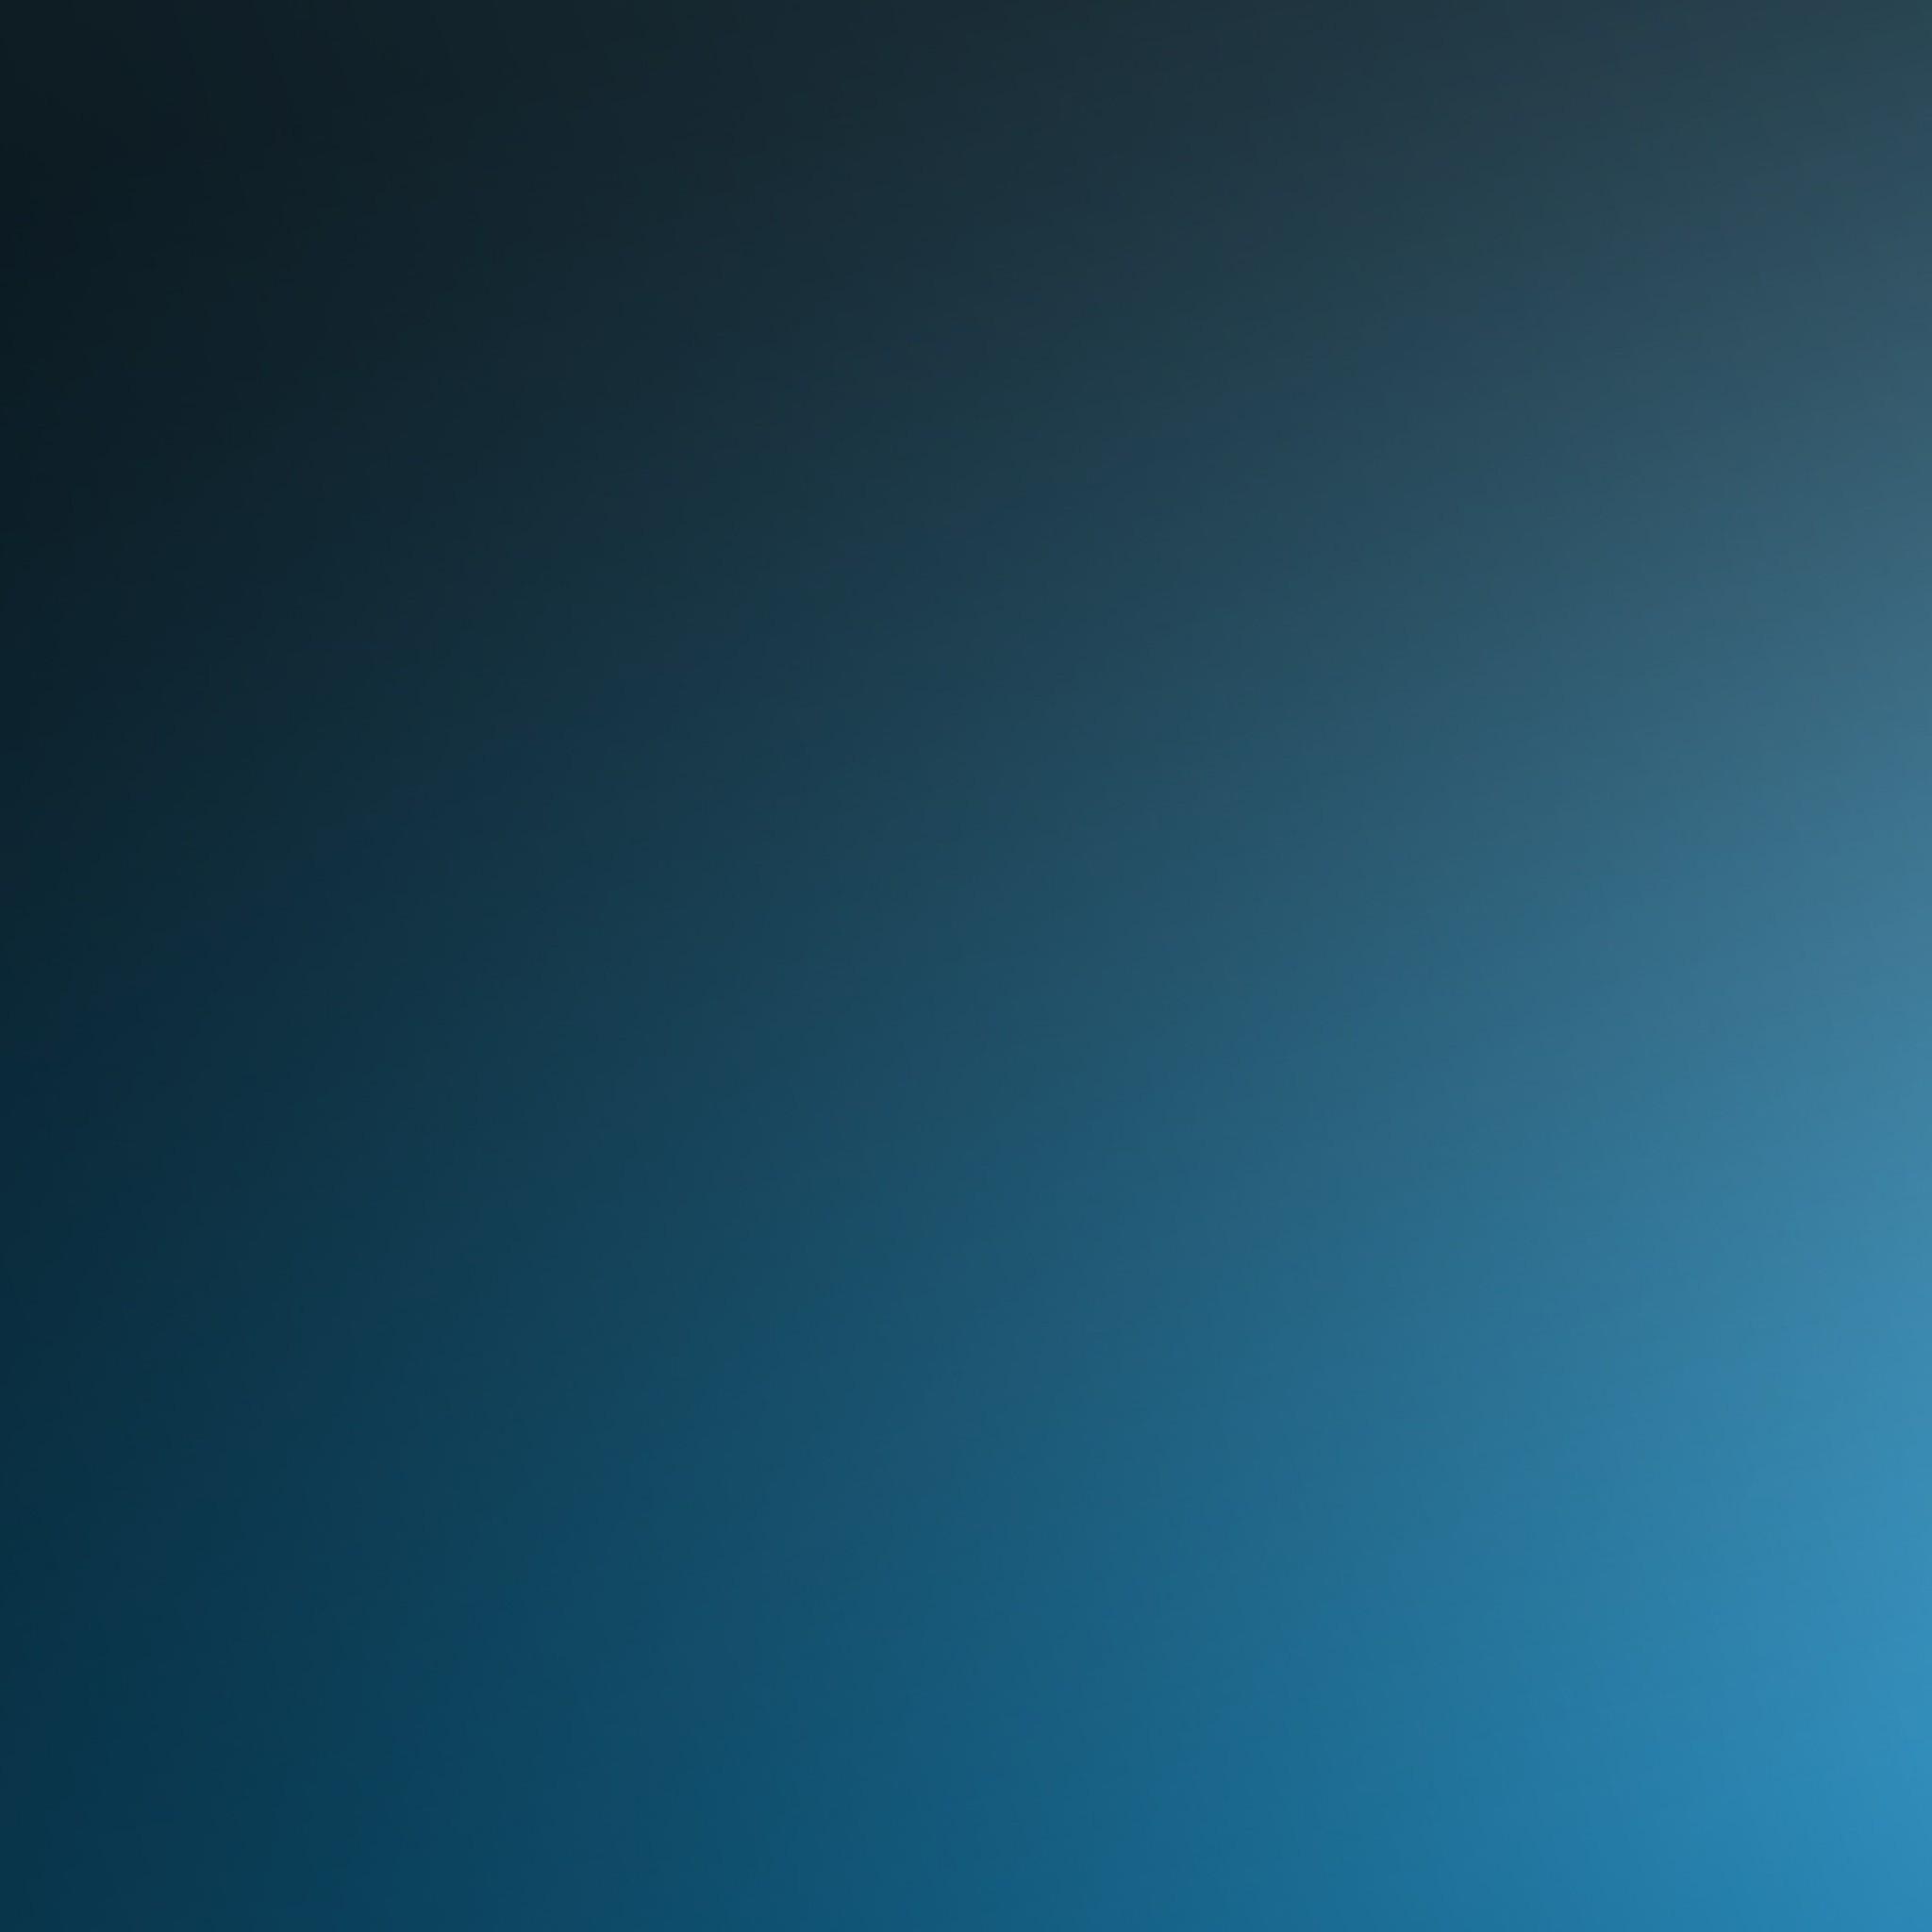 2048x2048 Solid Color Iphone Wallpaper 22725 HD Desktop